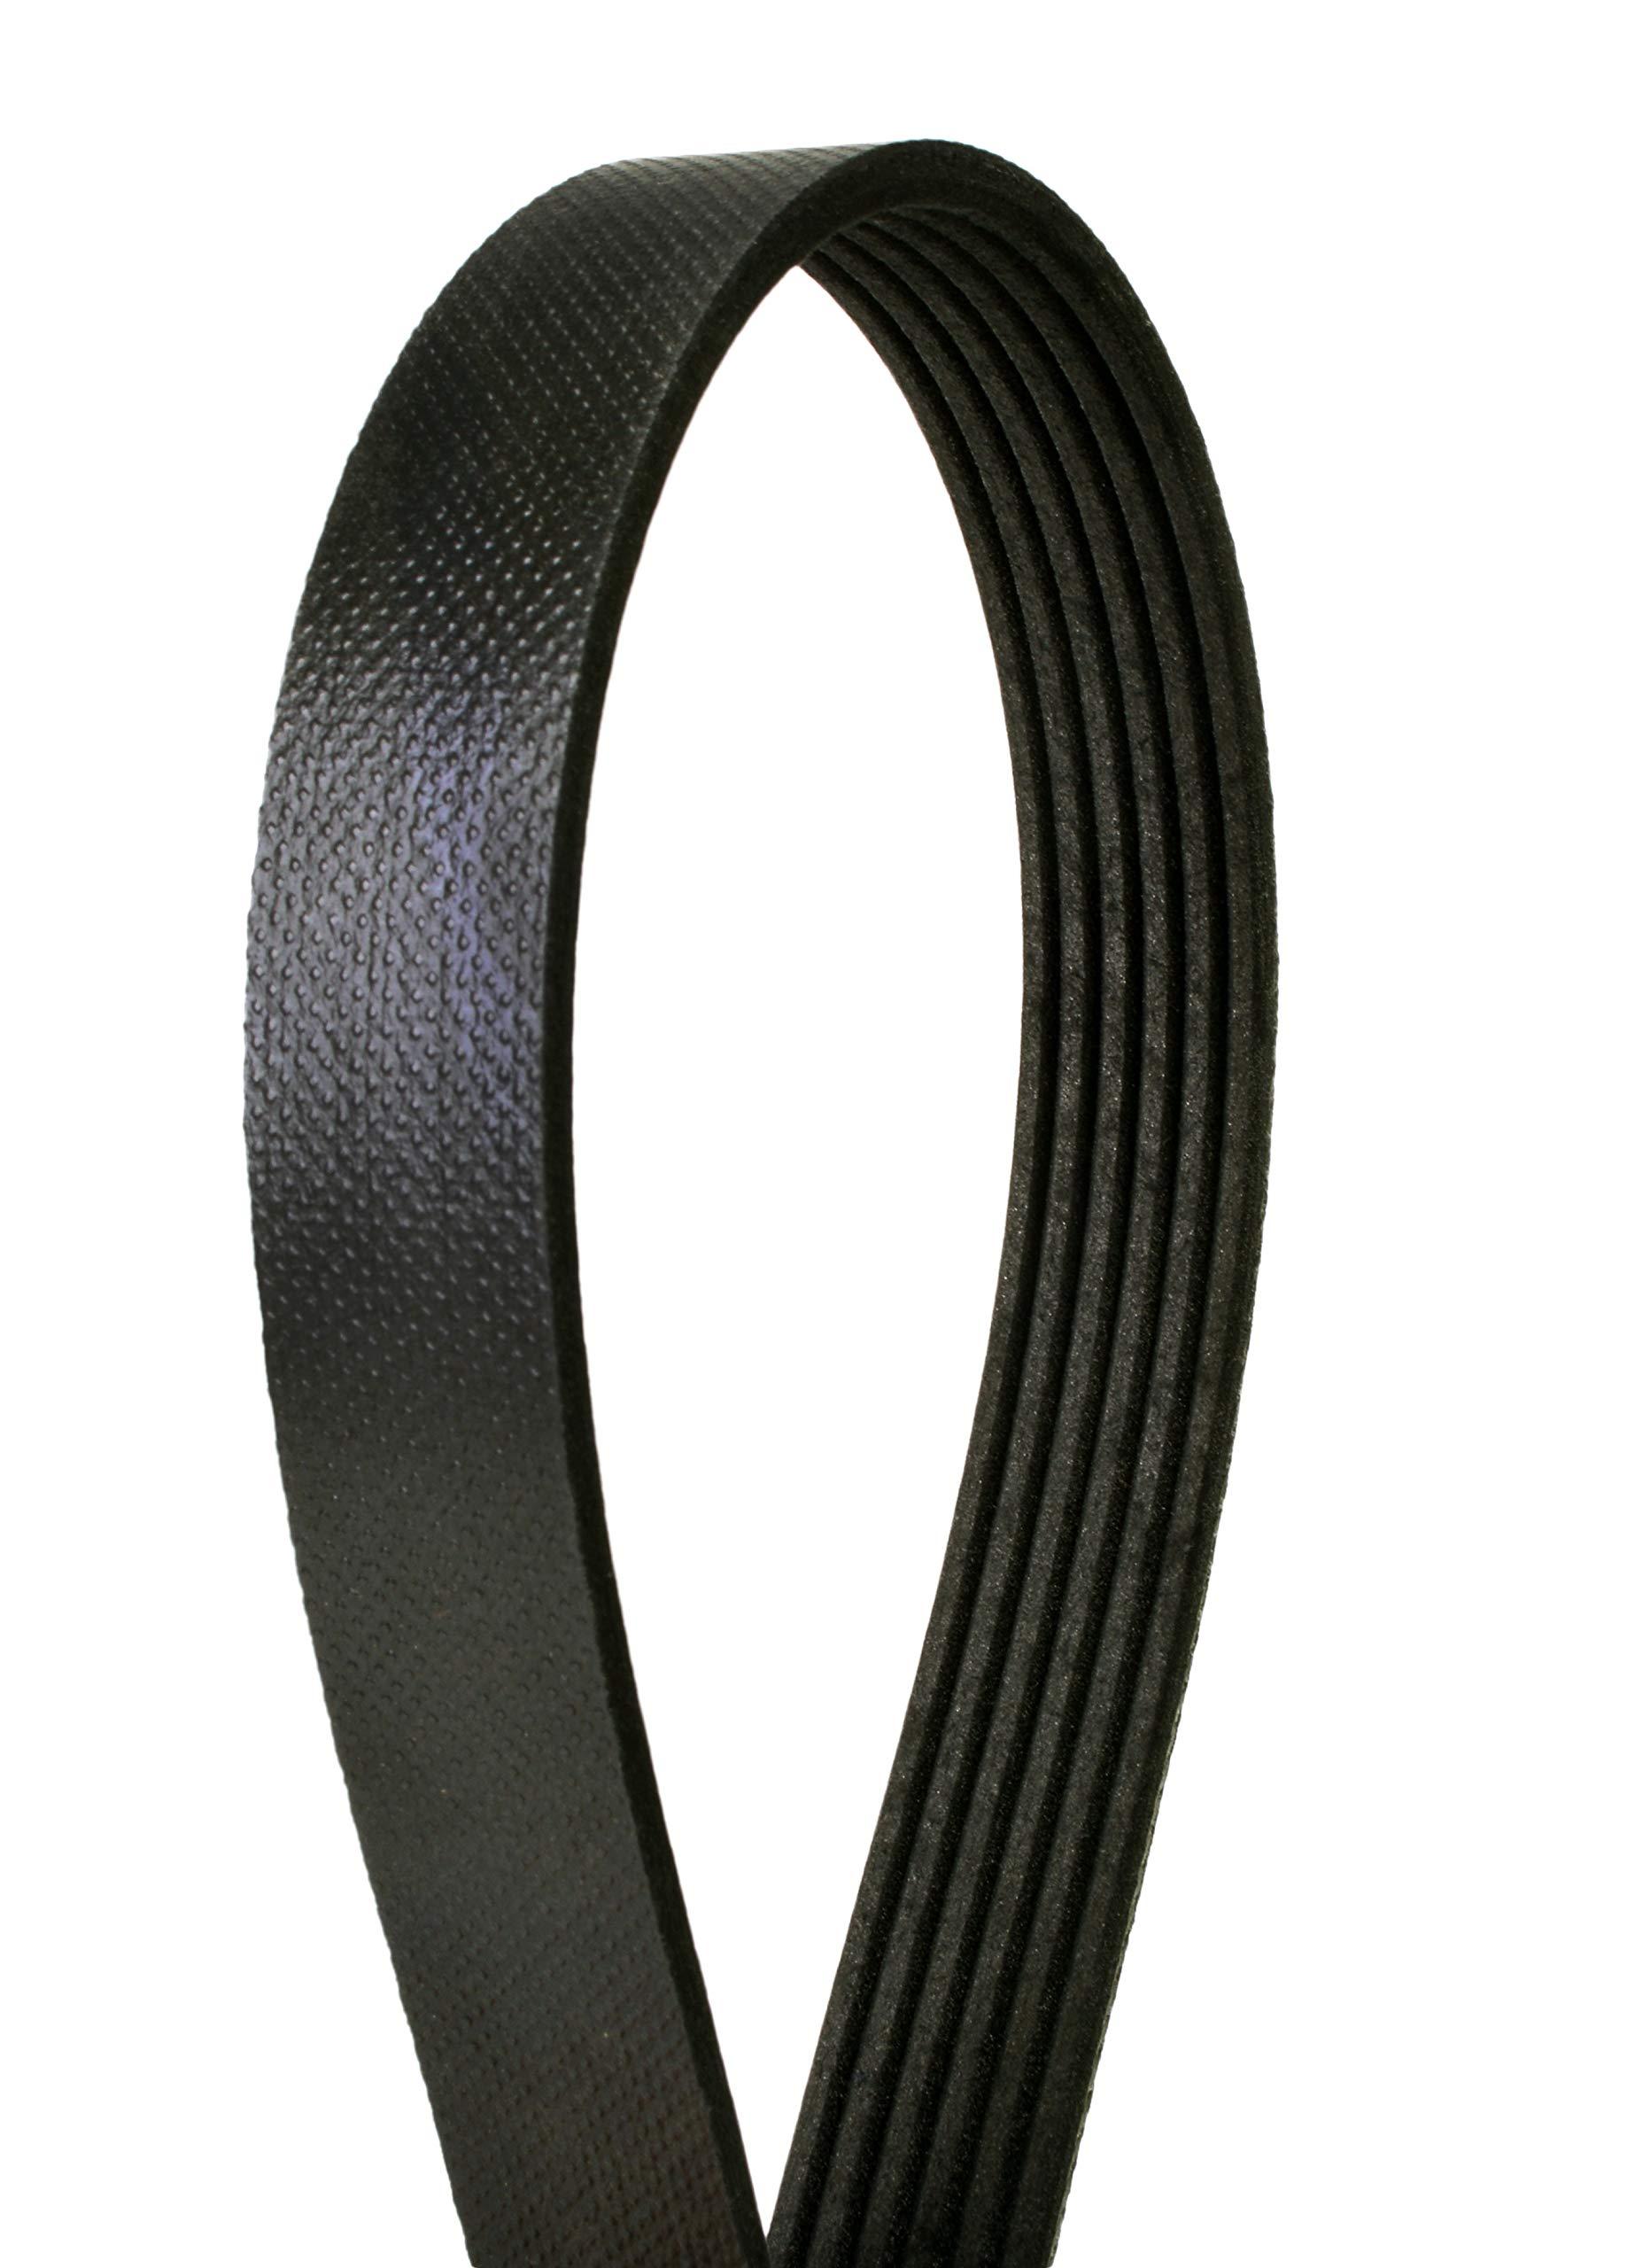 Continental OE Technology Series 4101045 10-Rib 104.5 Multi-V Belt